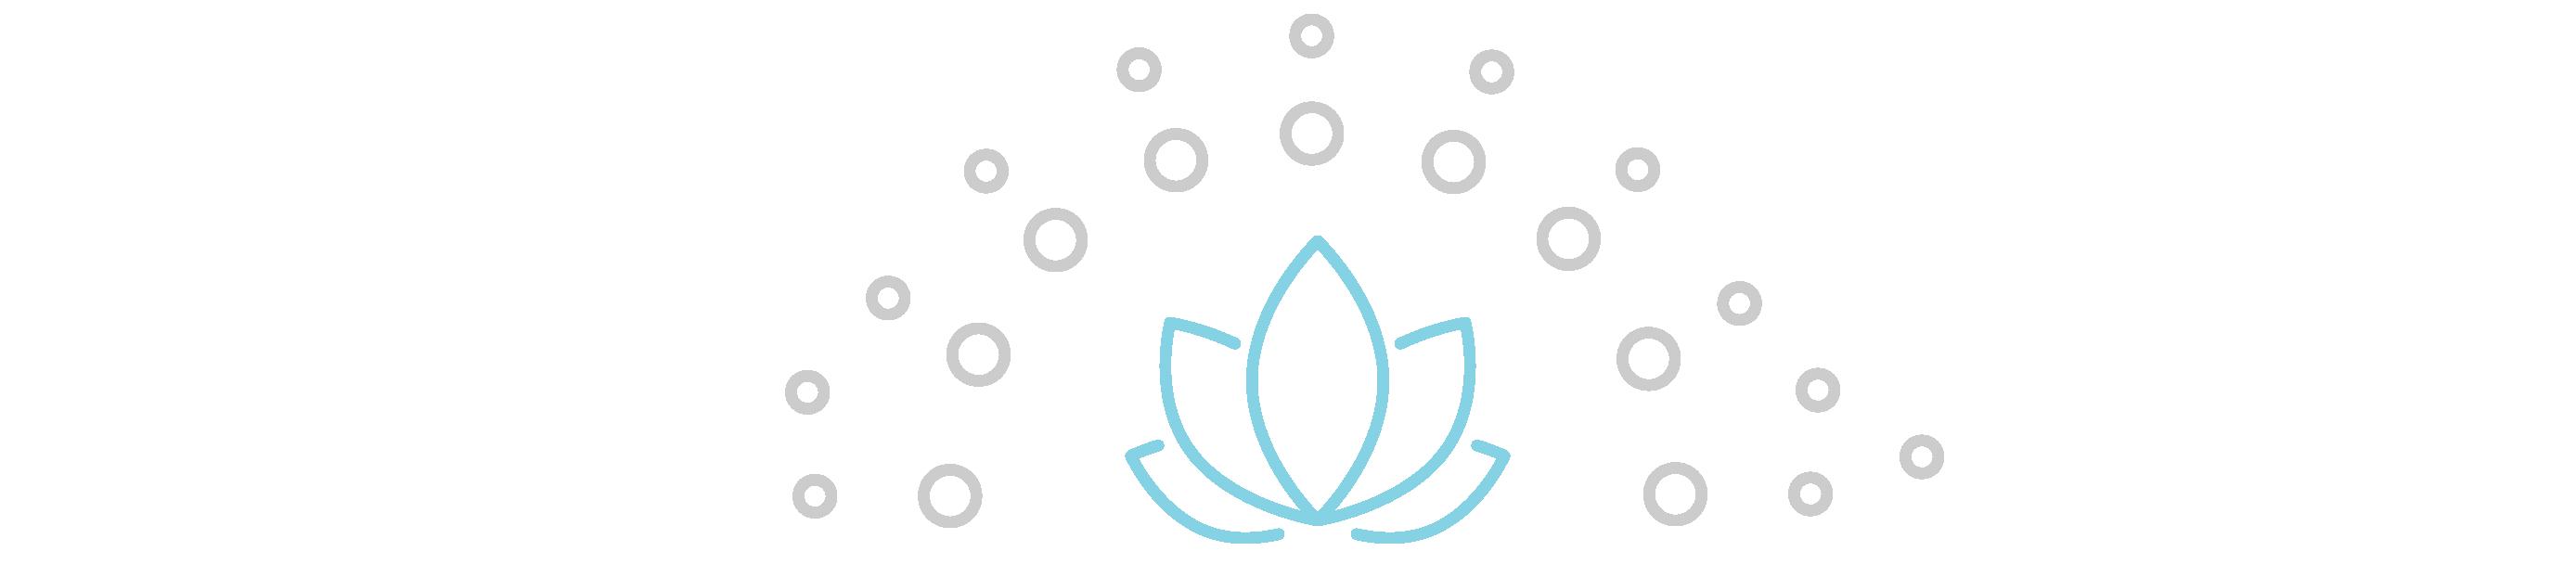 Vera Blog 6.18 Mindfulness@4x